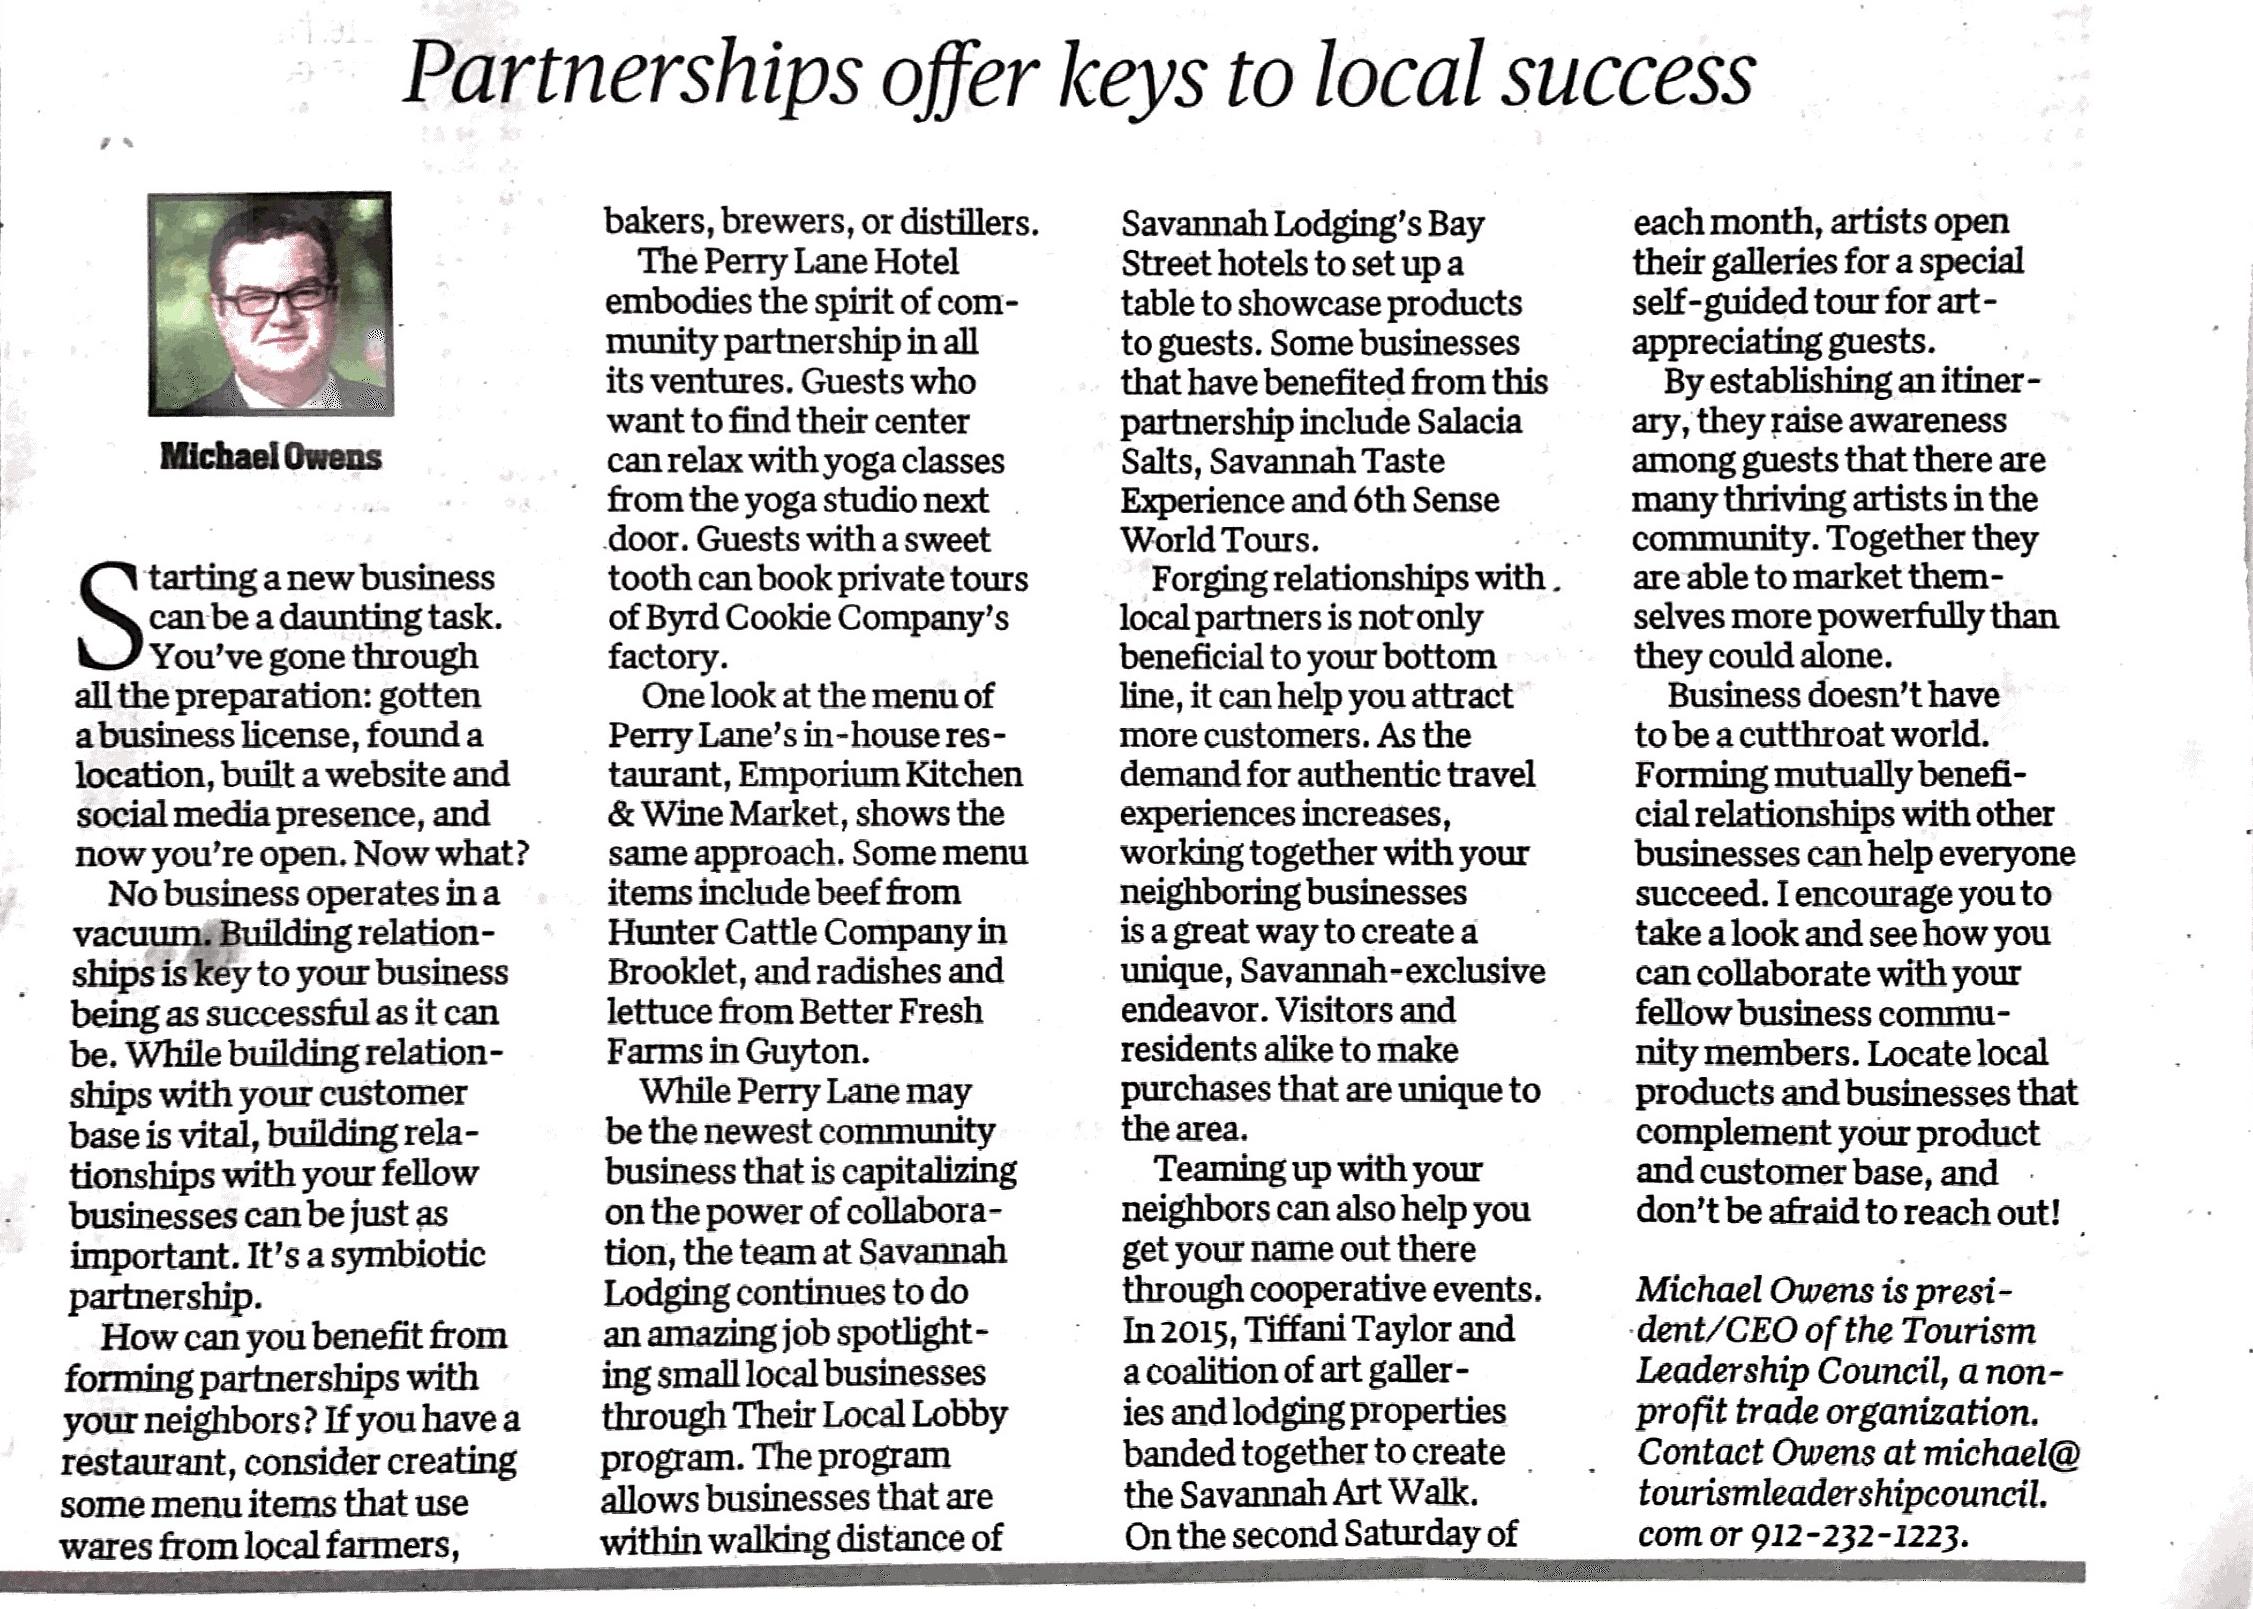 Business section of Savannah Morning news writes on the Savannah Art Walk and Tiffani Taylor